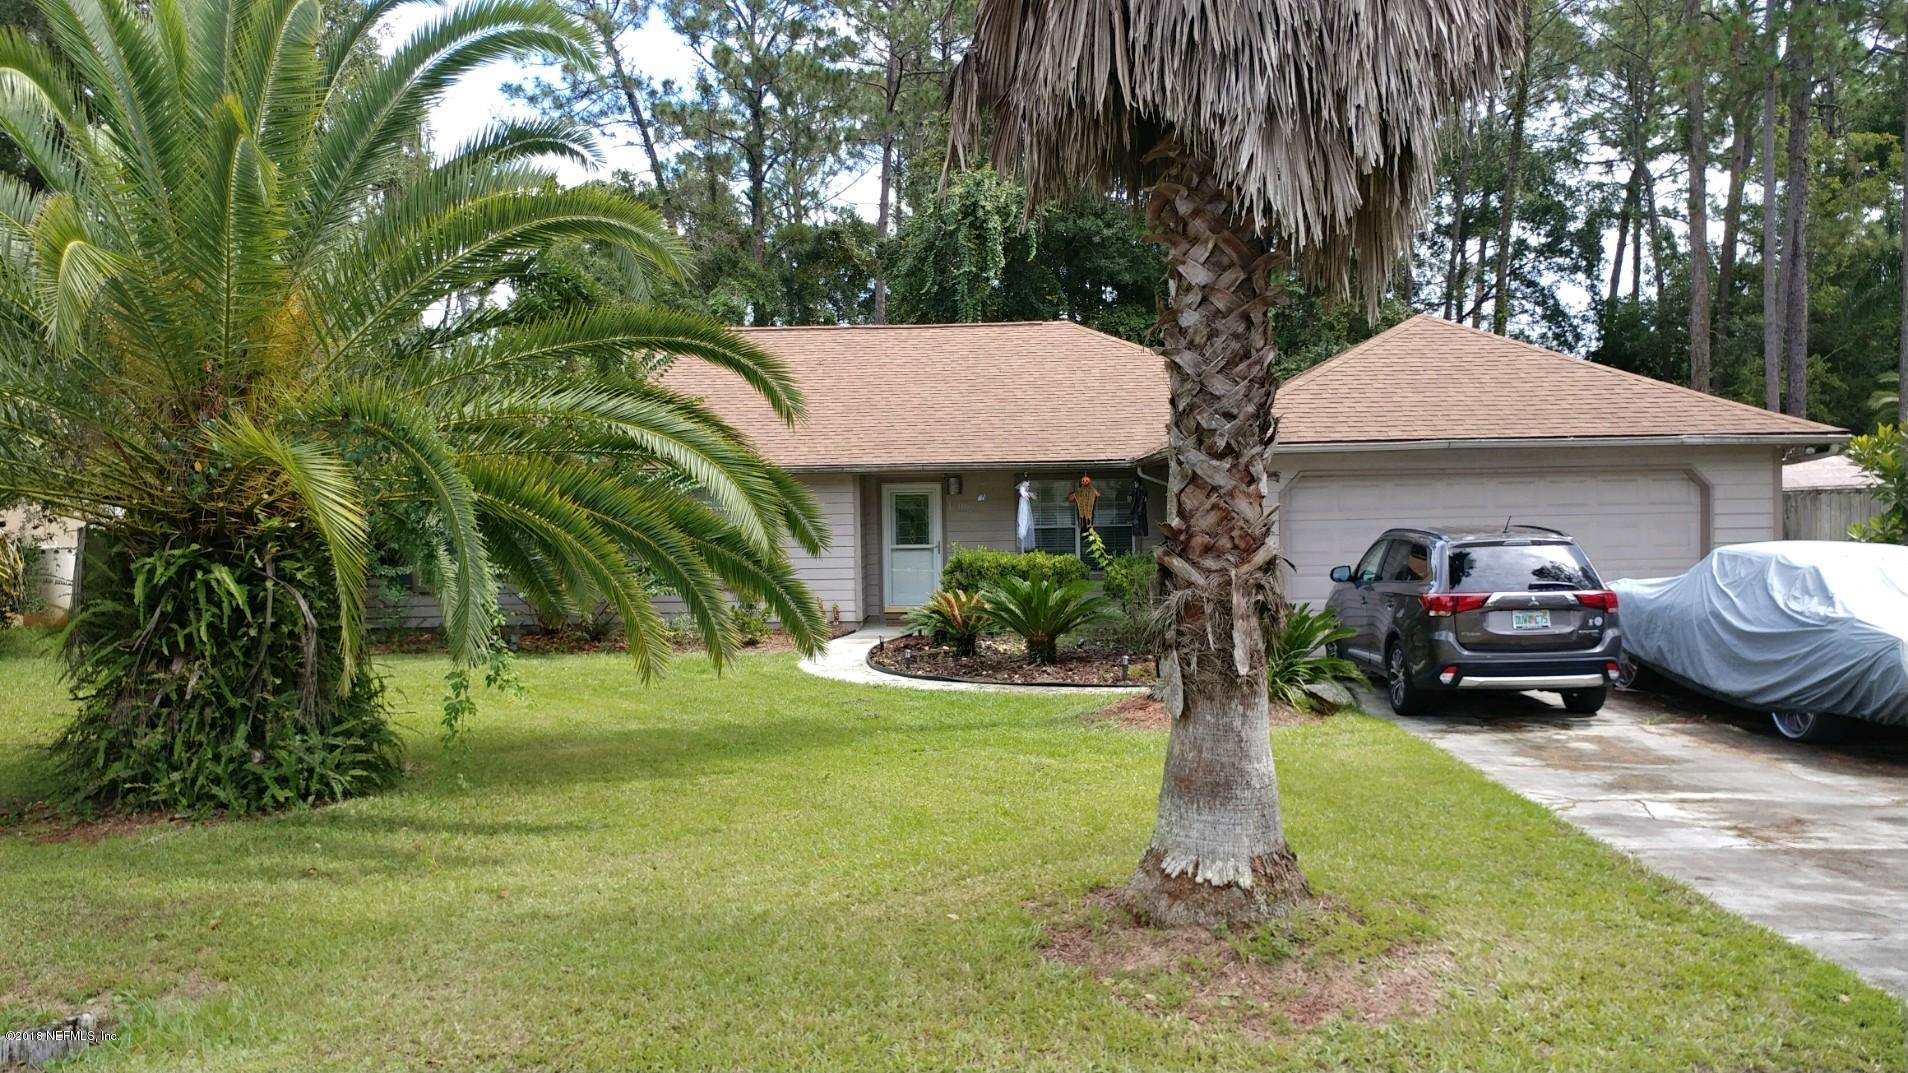 1600 LEMONWOOD, JACKSONVILLE, FLORIDA 32259, 3 Bedrooms Bedrooms, ,2 BathroomsBathrooms,Residential - single family,For sale,LEMONWOOD,960221